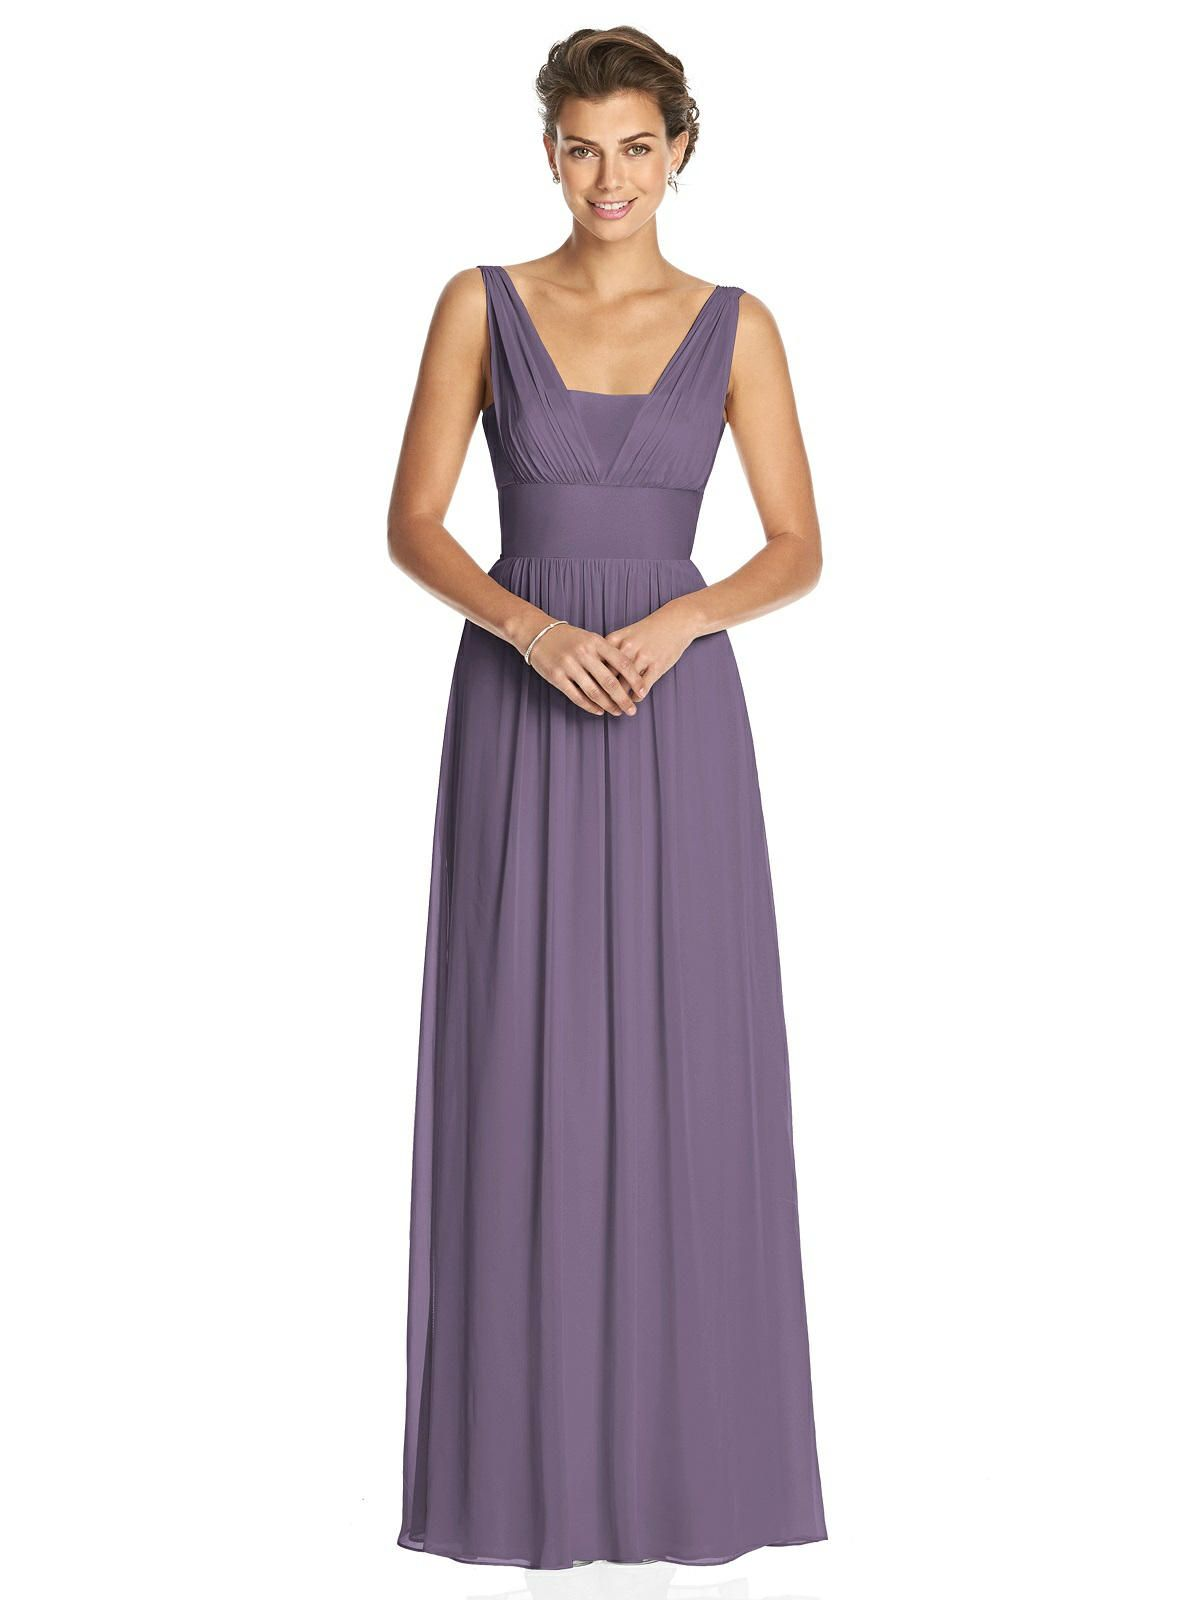 b7cd28ef17 Dessy Group Bridesmaid Dress Prices - Gomes Weine AG